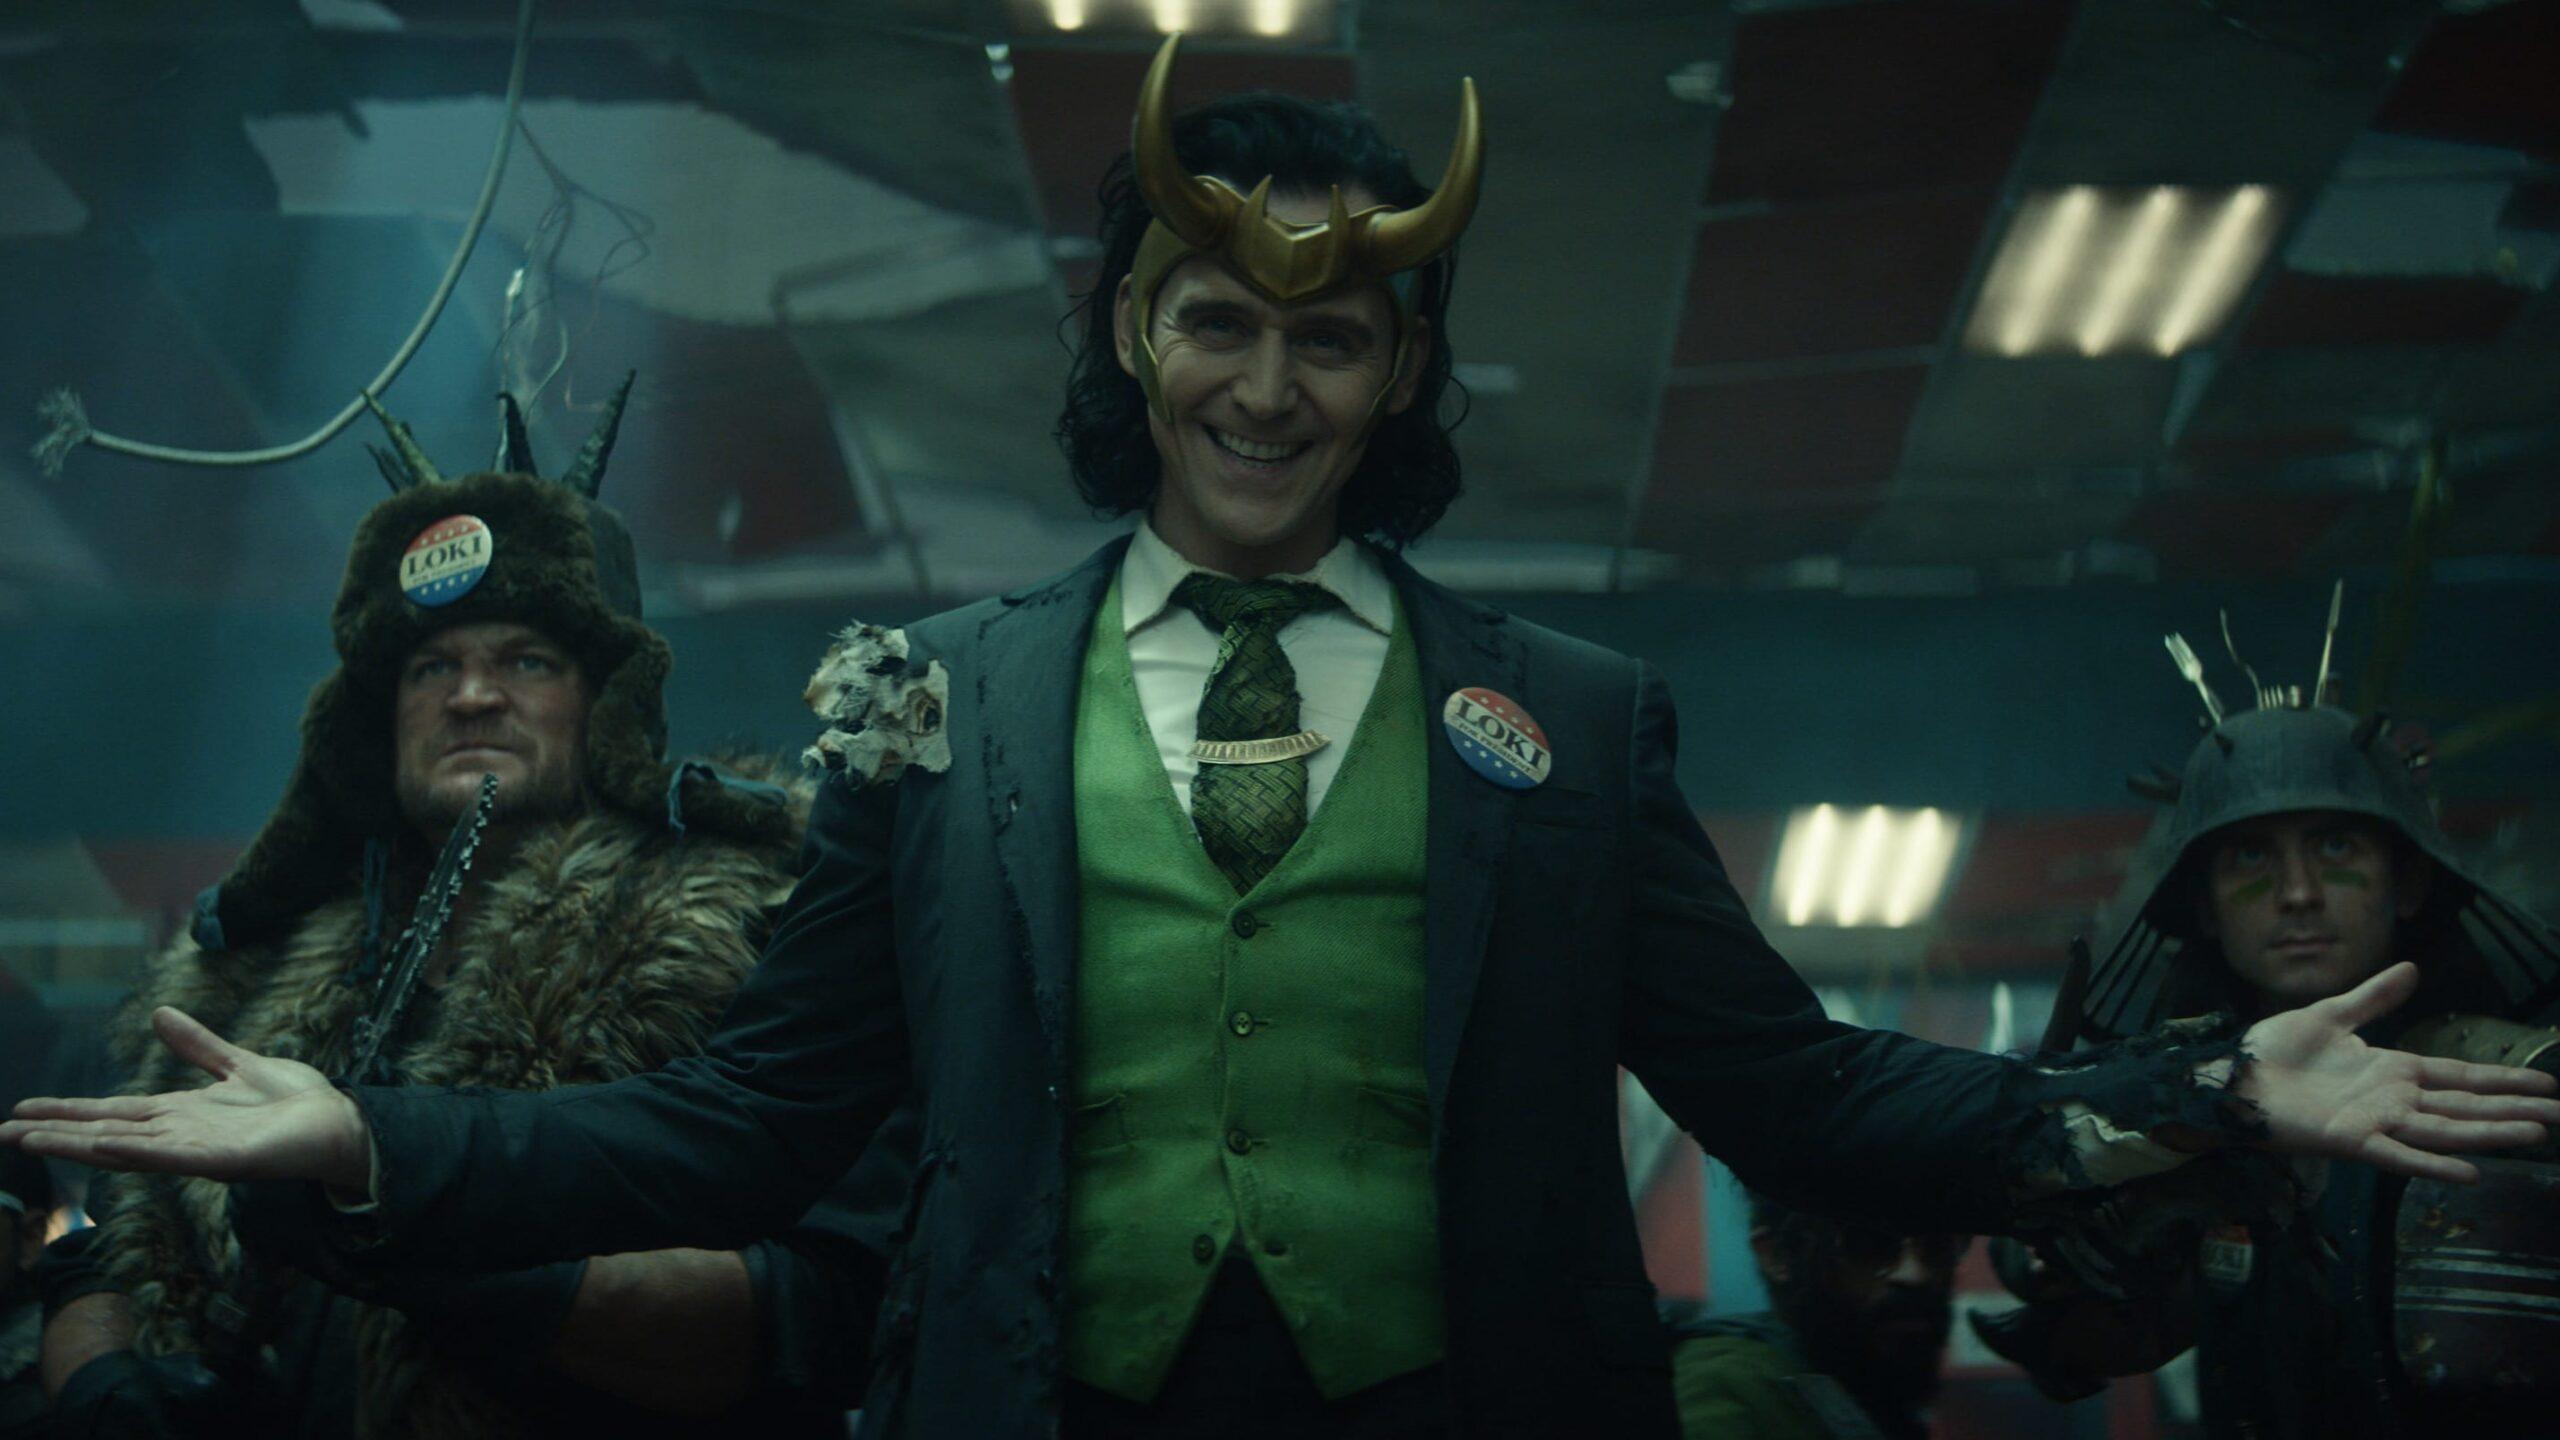 Mythology: Stories of Loki the God of Mischief